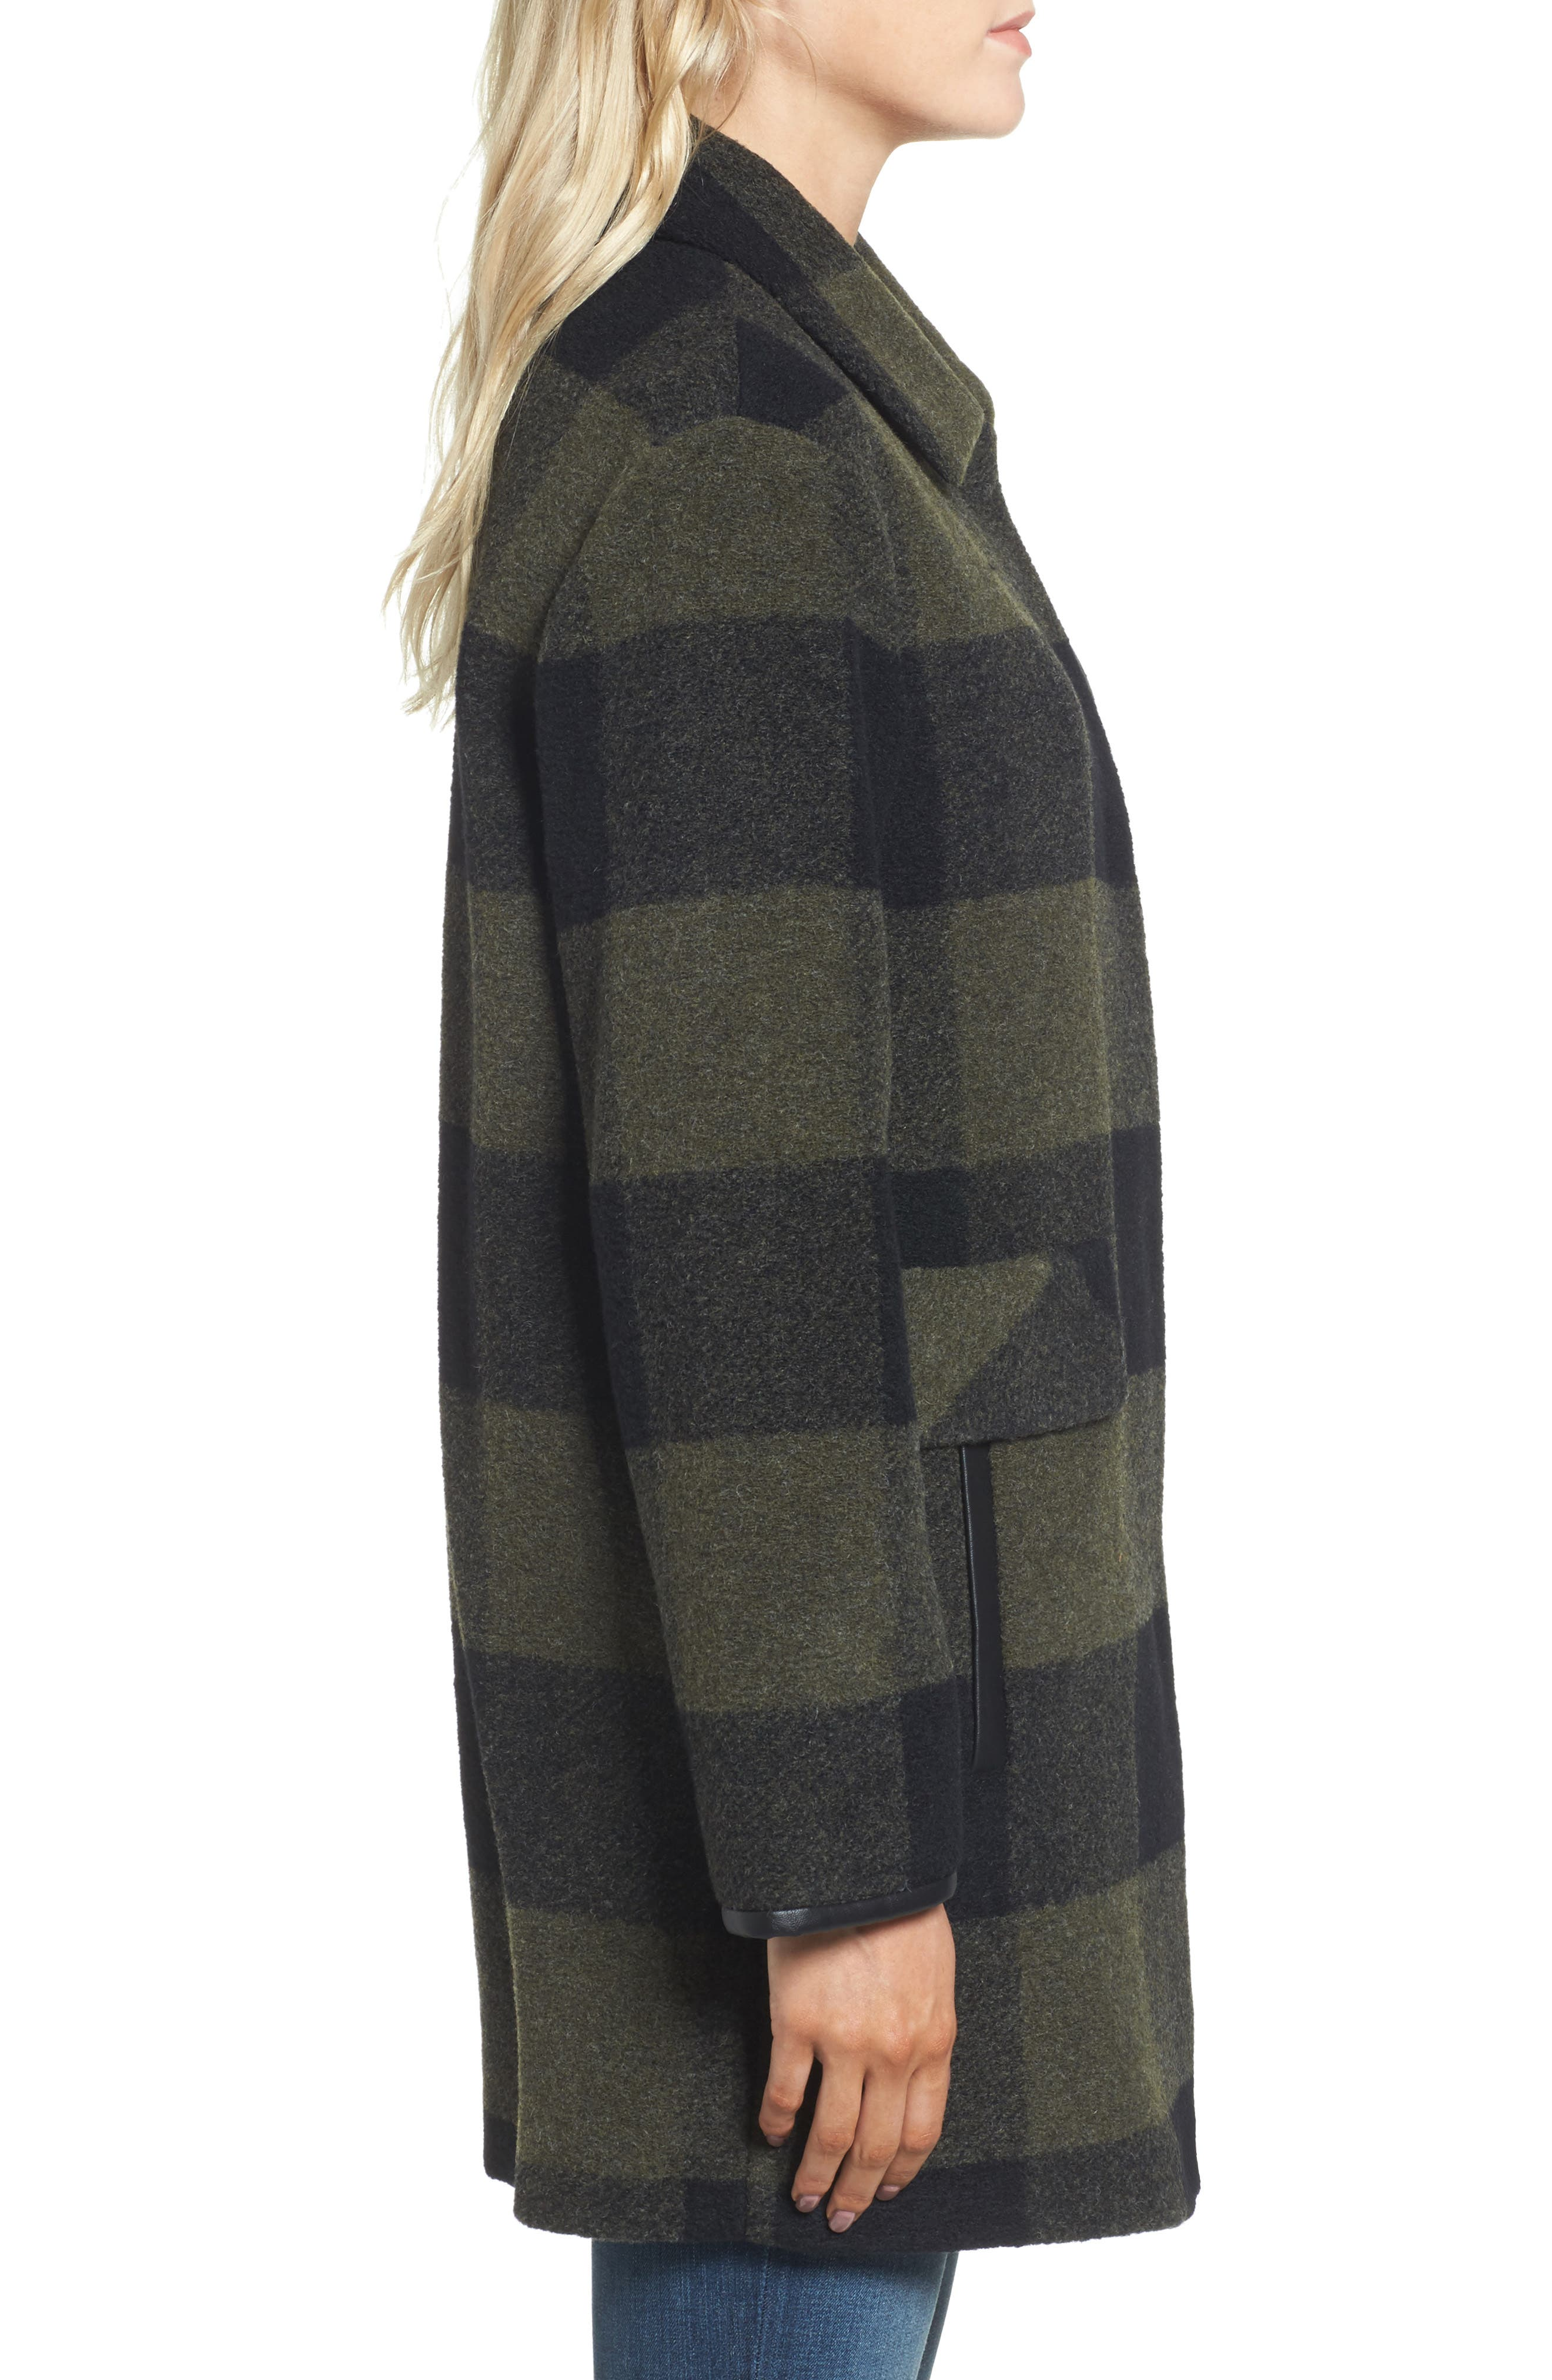 Paul Bunyan Plaid Wool Blend Barn Coat,                             Alternate thumbnail 3, color,                             342